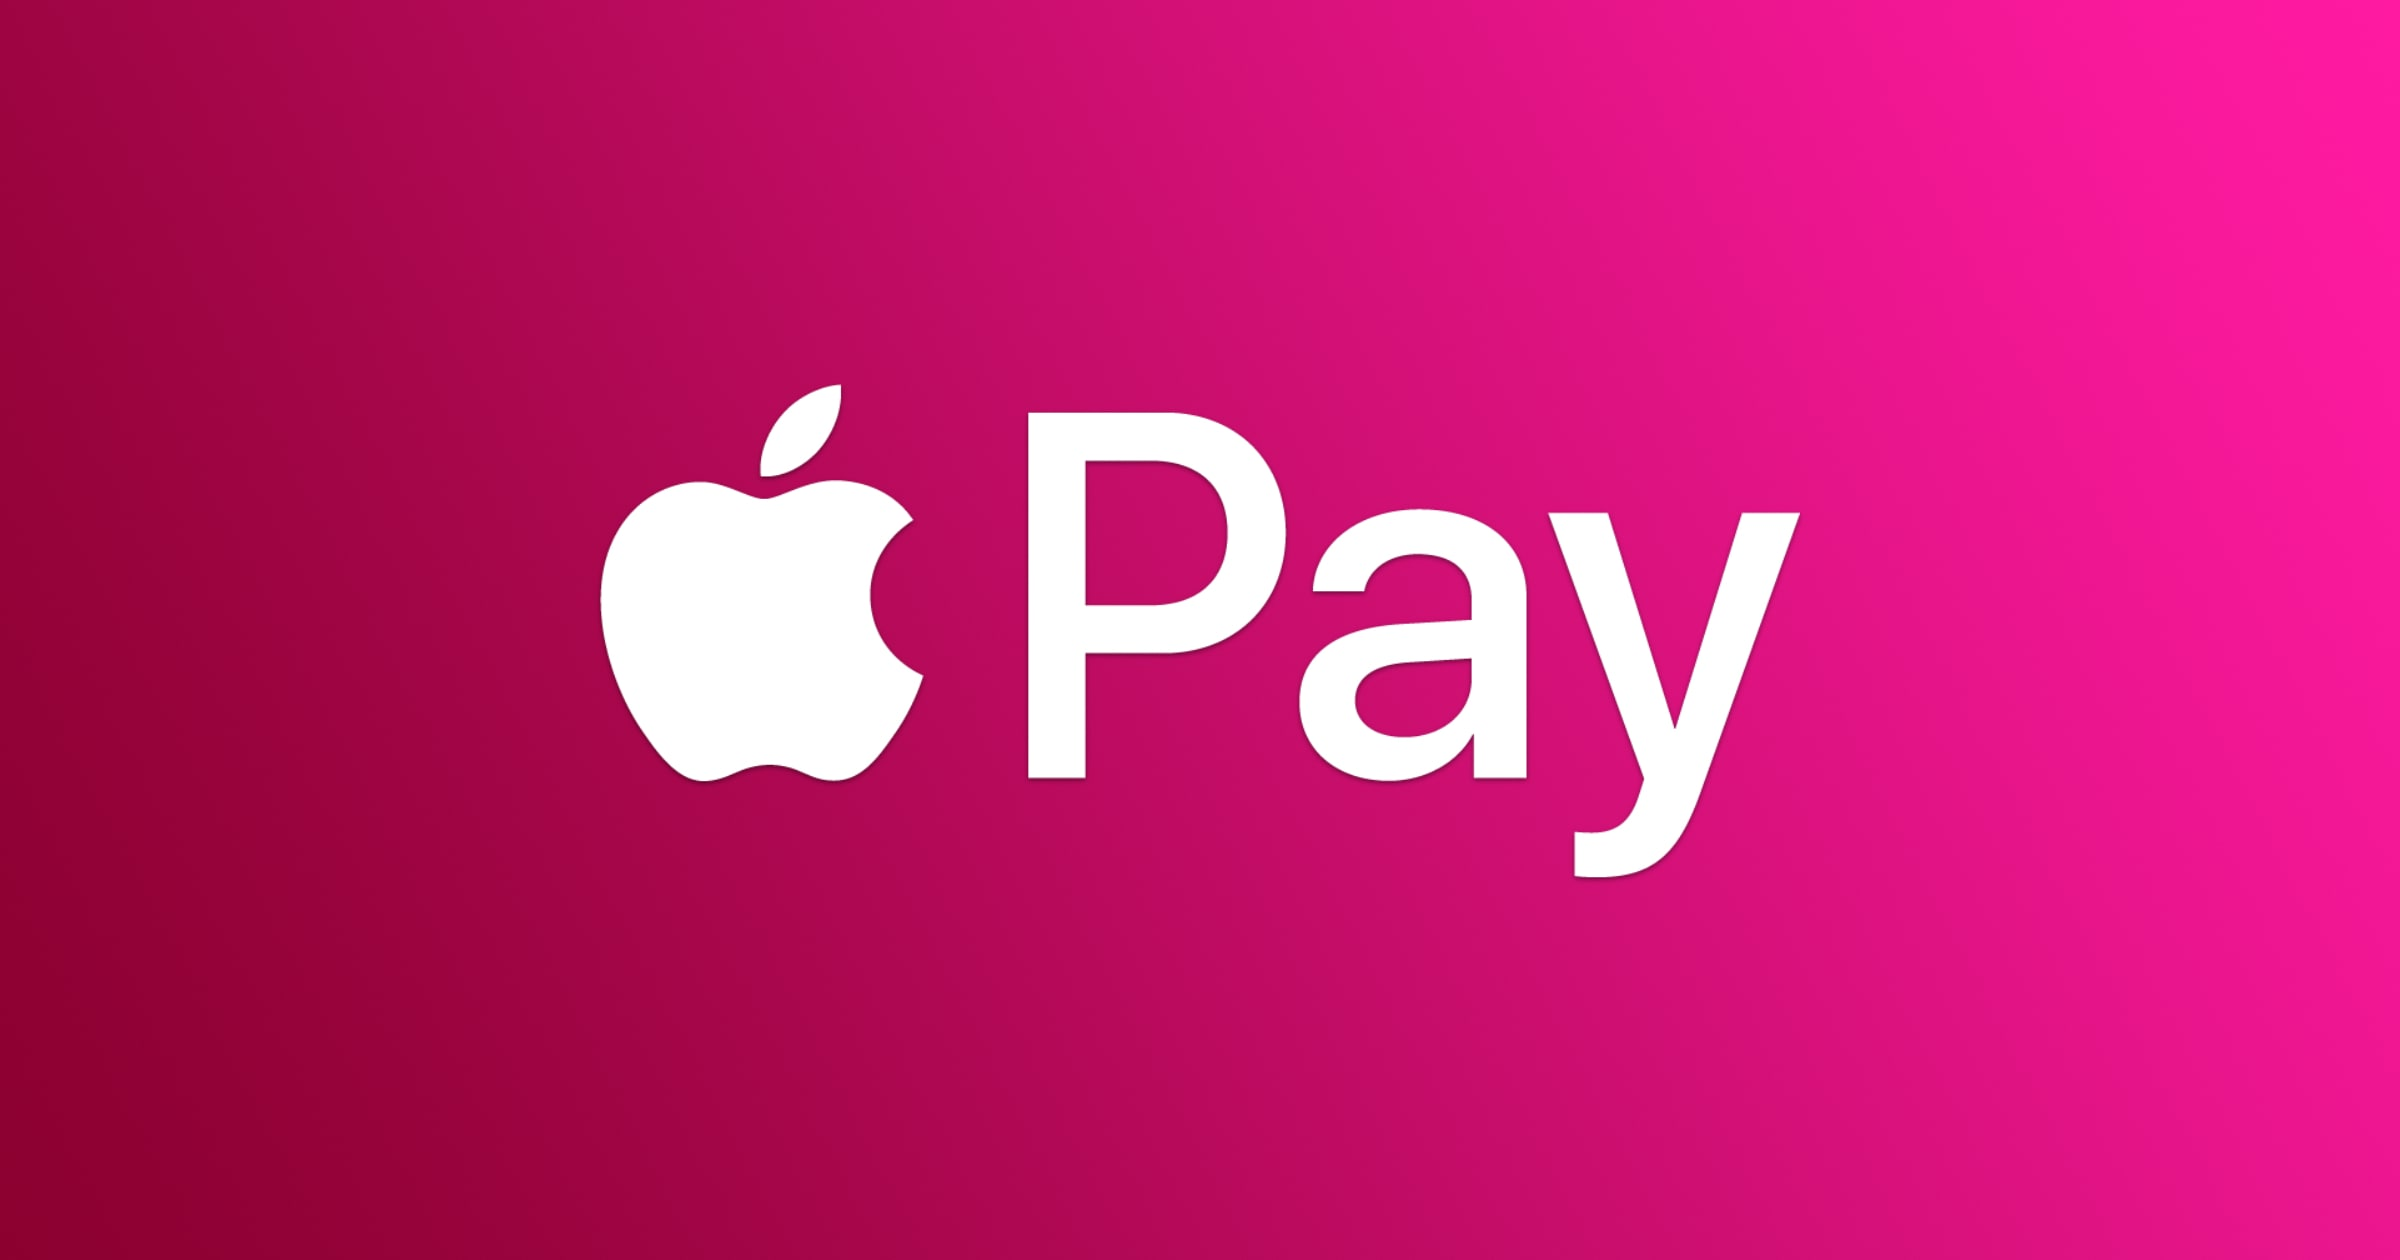 apple pay logo pink